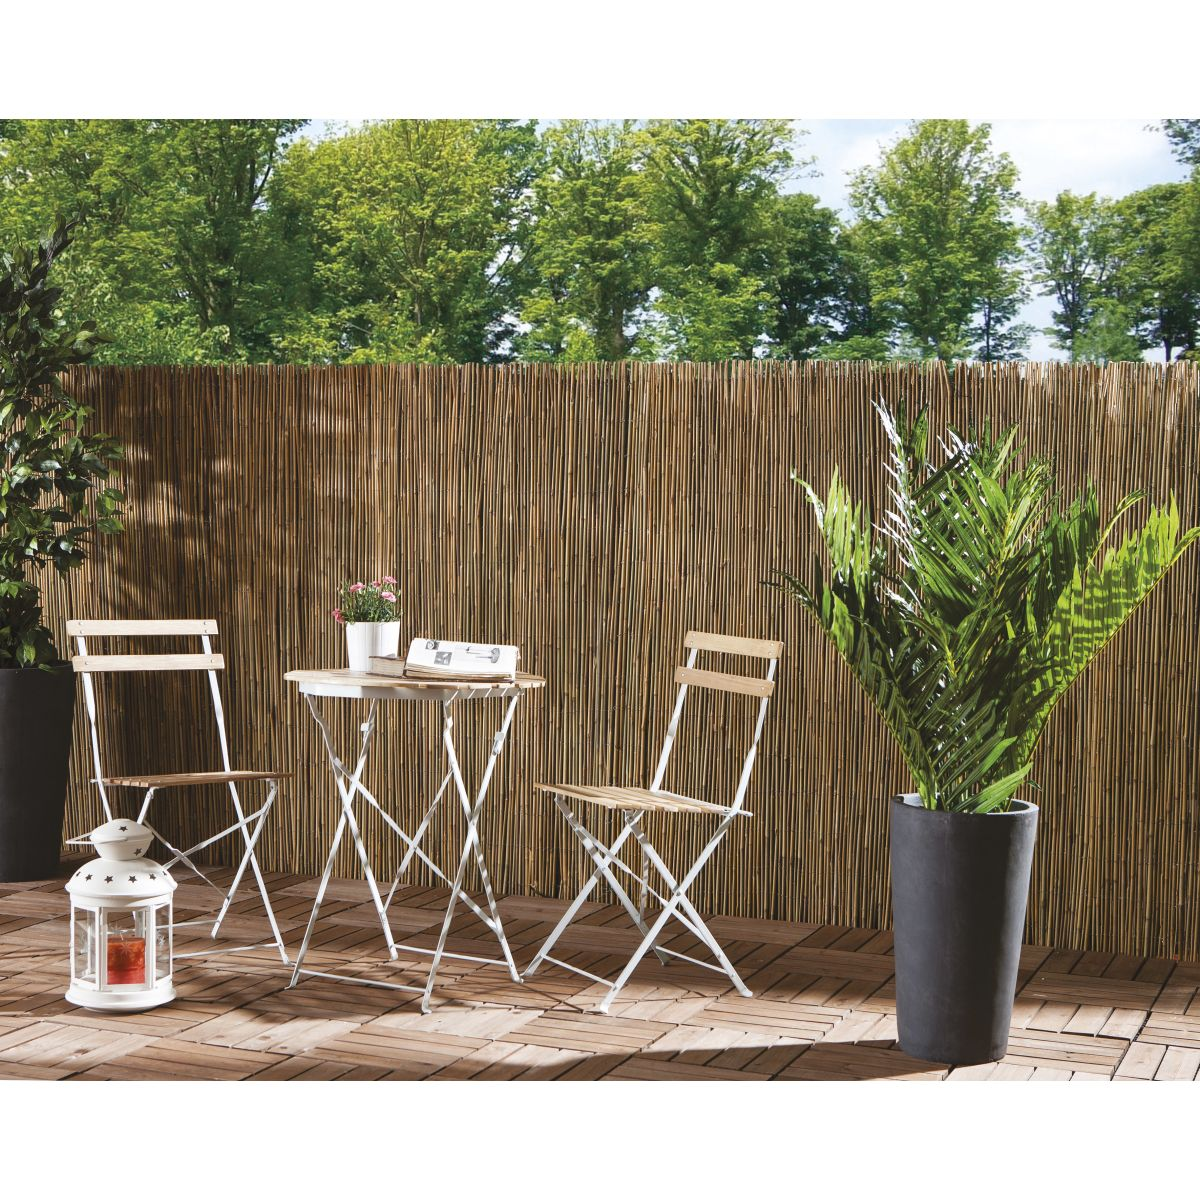 Fontane giardino ikea con teli triangolari per giardino for Tettoie in legno leroy merlin